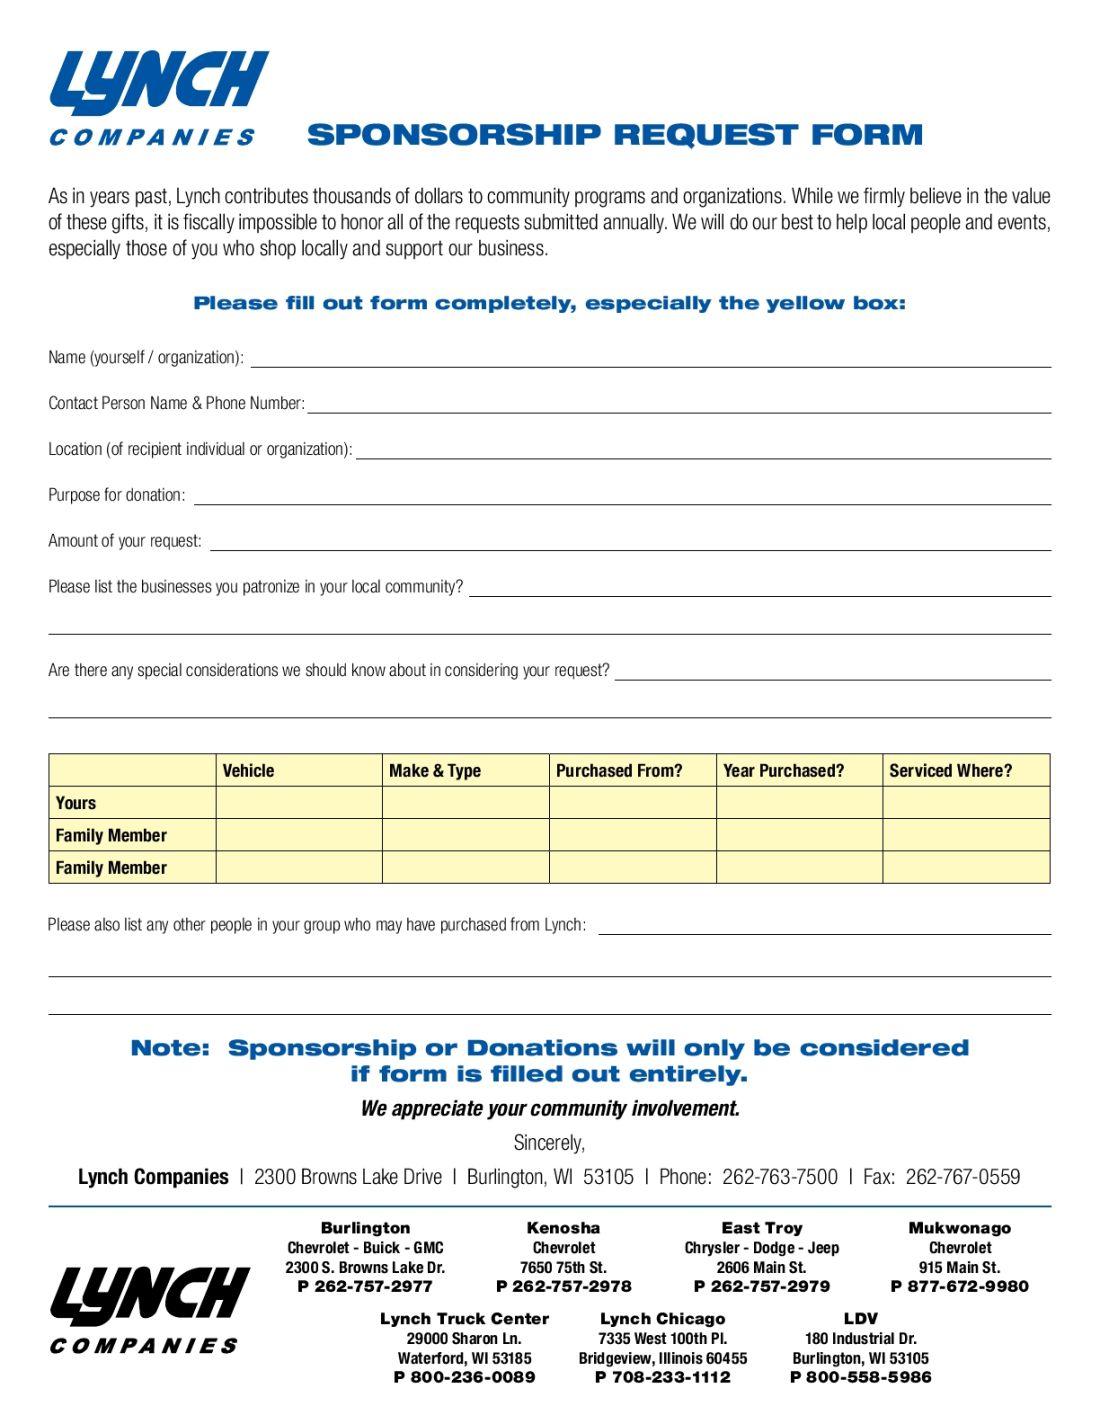 Lynch Companies – Sponsorship Request Form